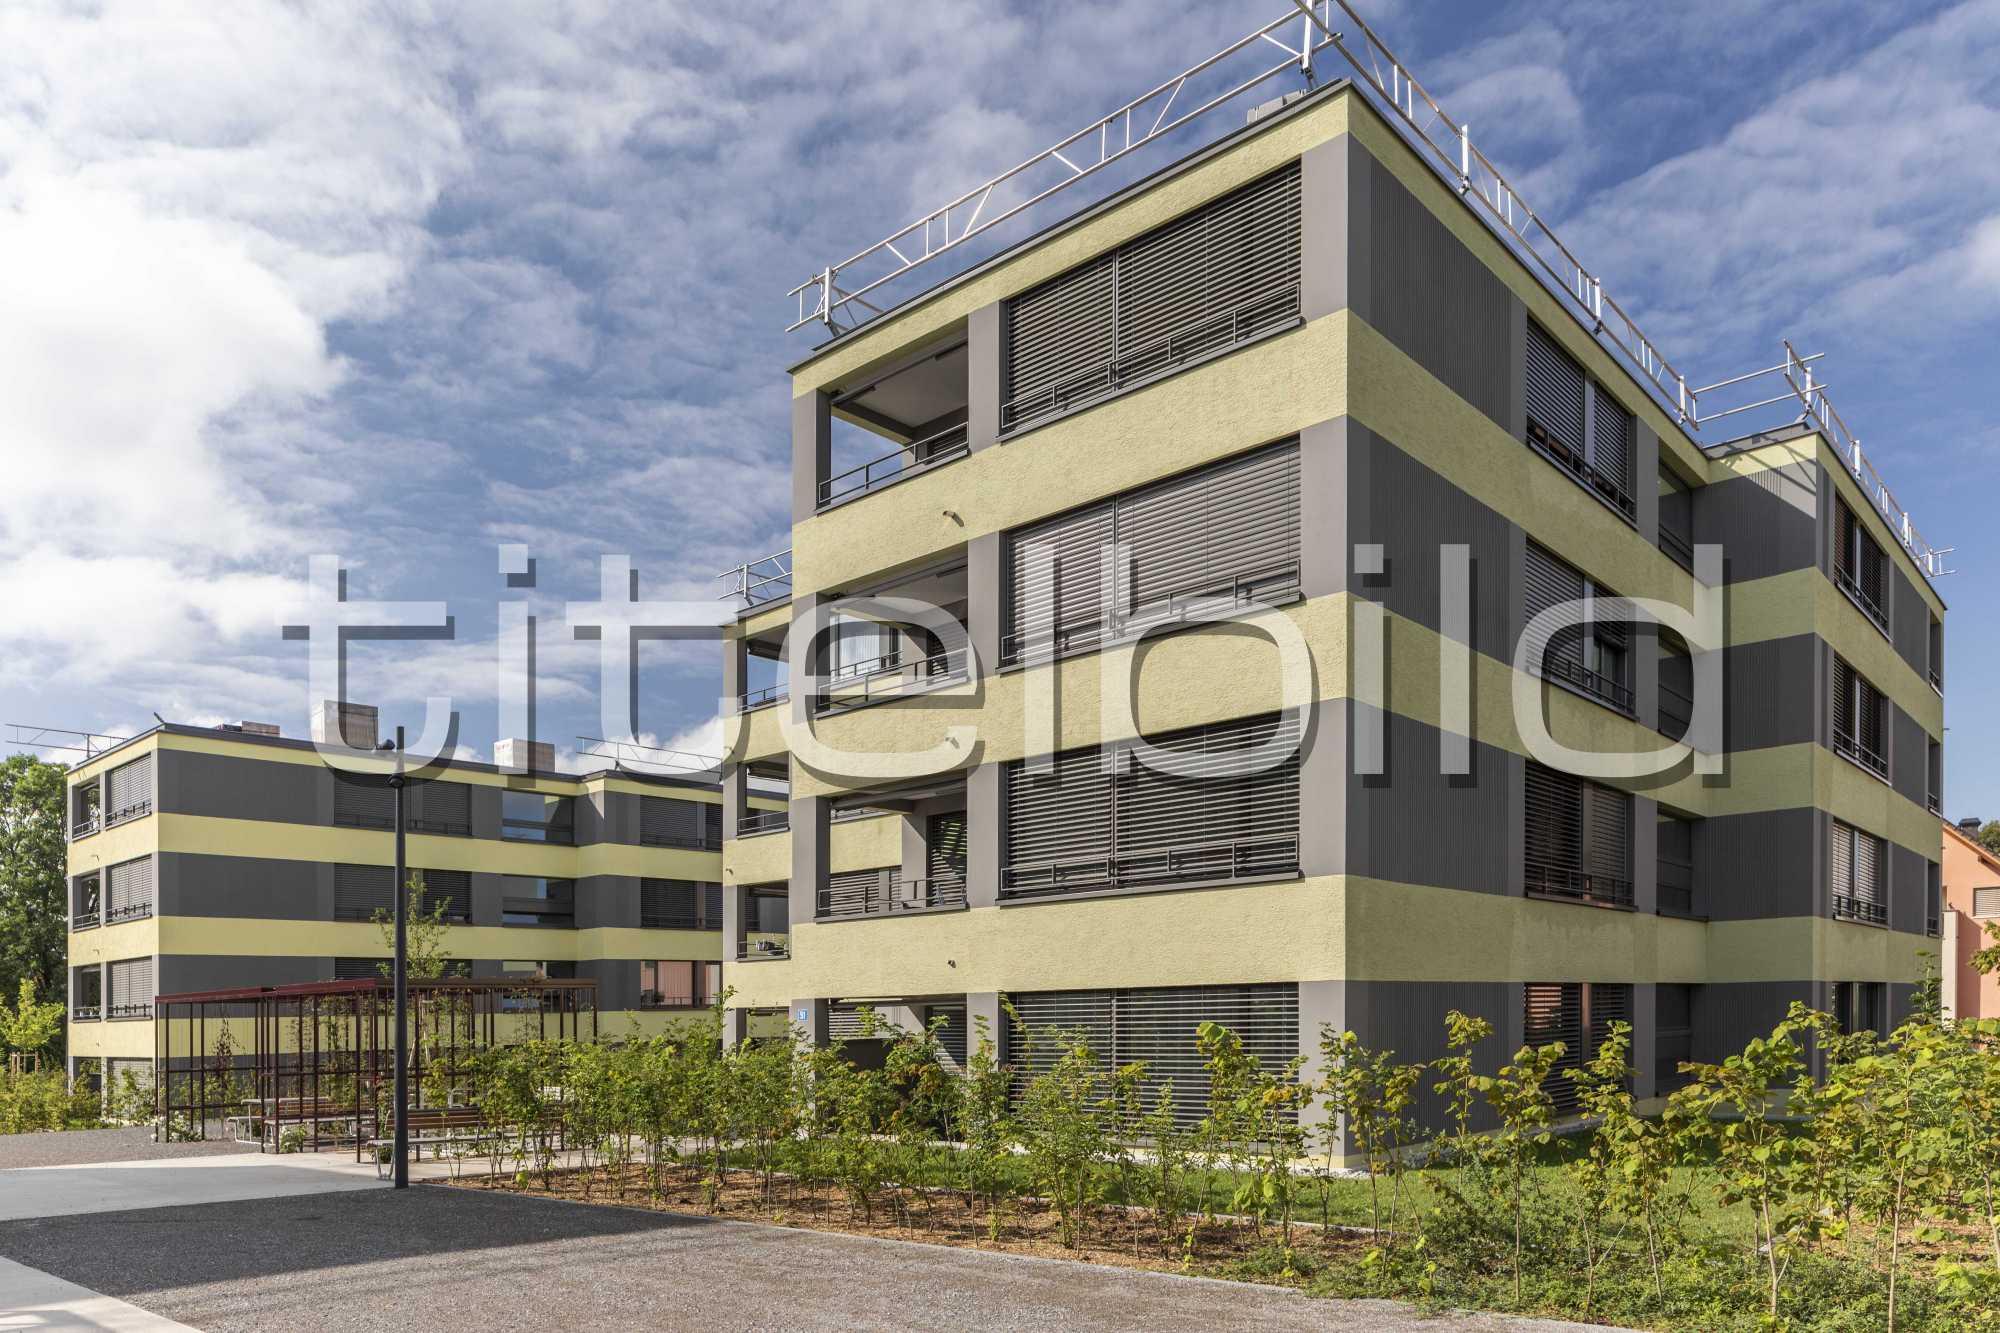 Projektbild-Nr. 3: Wohnsiedlung Pfaffenlebern , Rümlang